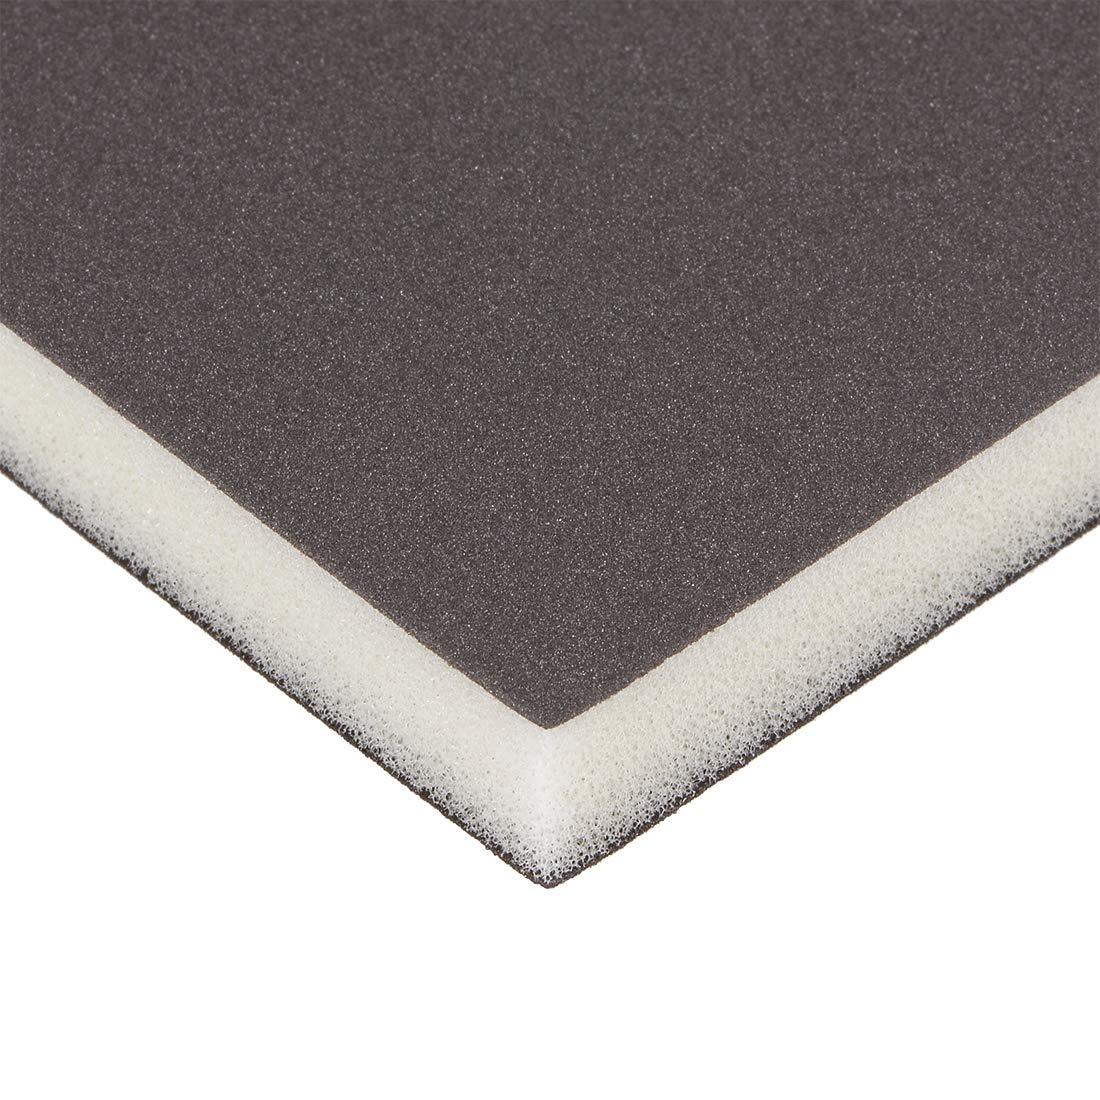 uxcell Sanding Sponge Sanding Block Pad 400 Grit 4.7inch X 3.9inch X 0.5inch Brown 3pcs